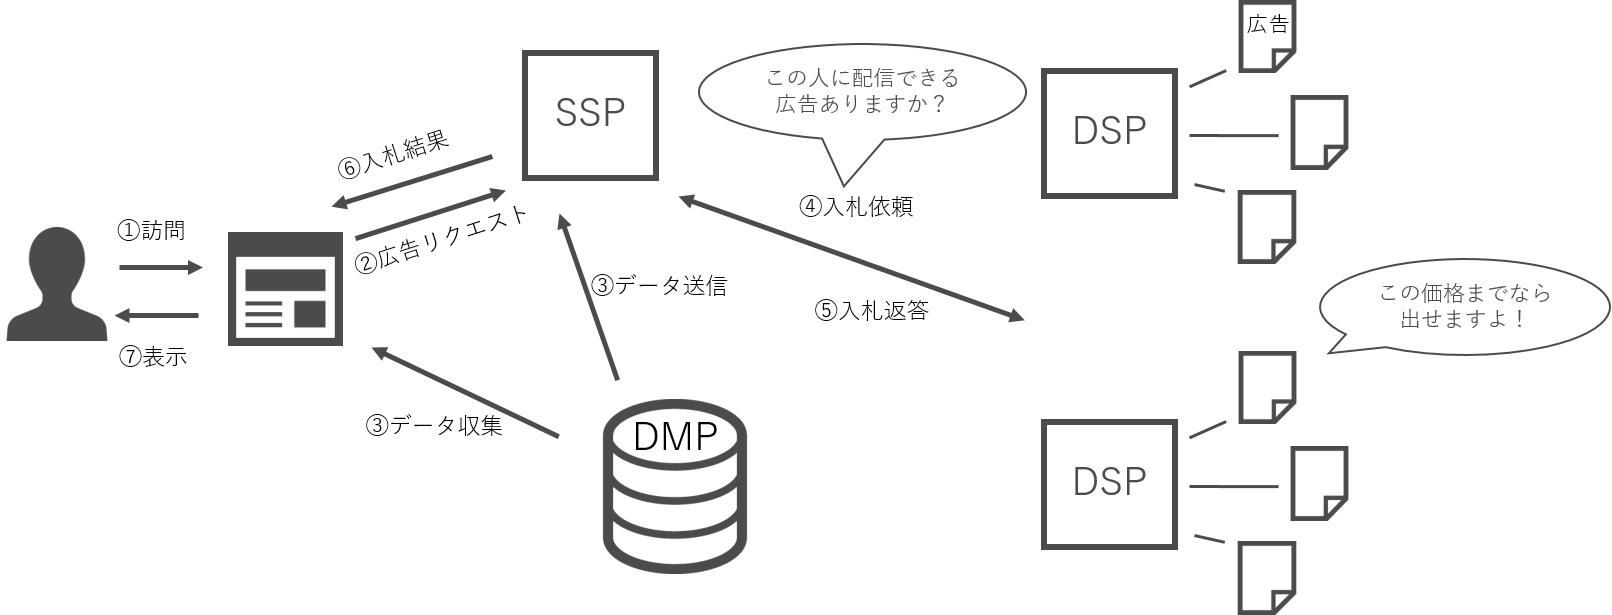 DMPのイメージ図